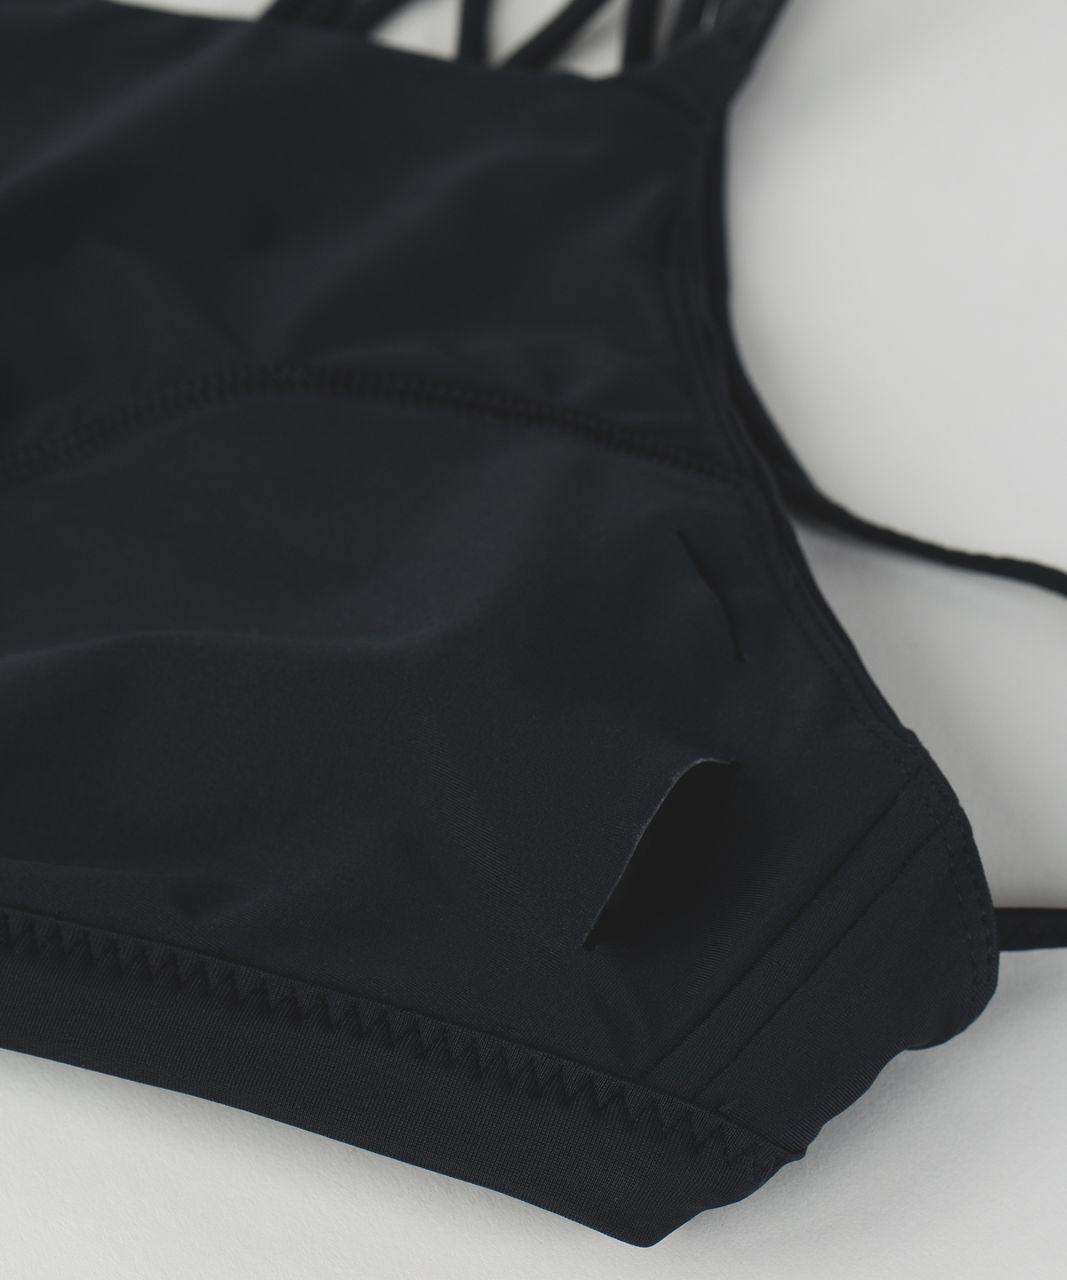 Lululemon Tidal Flow Net Top - Black